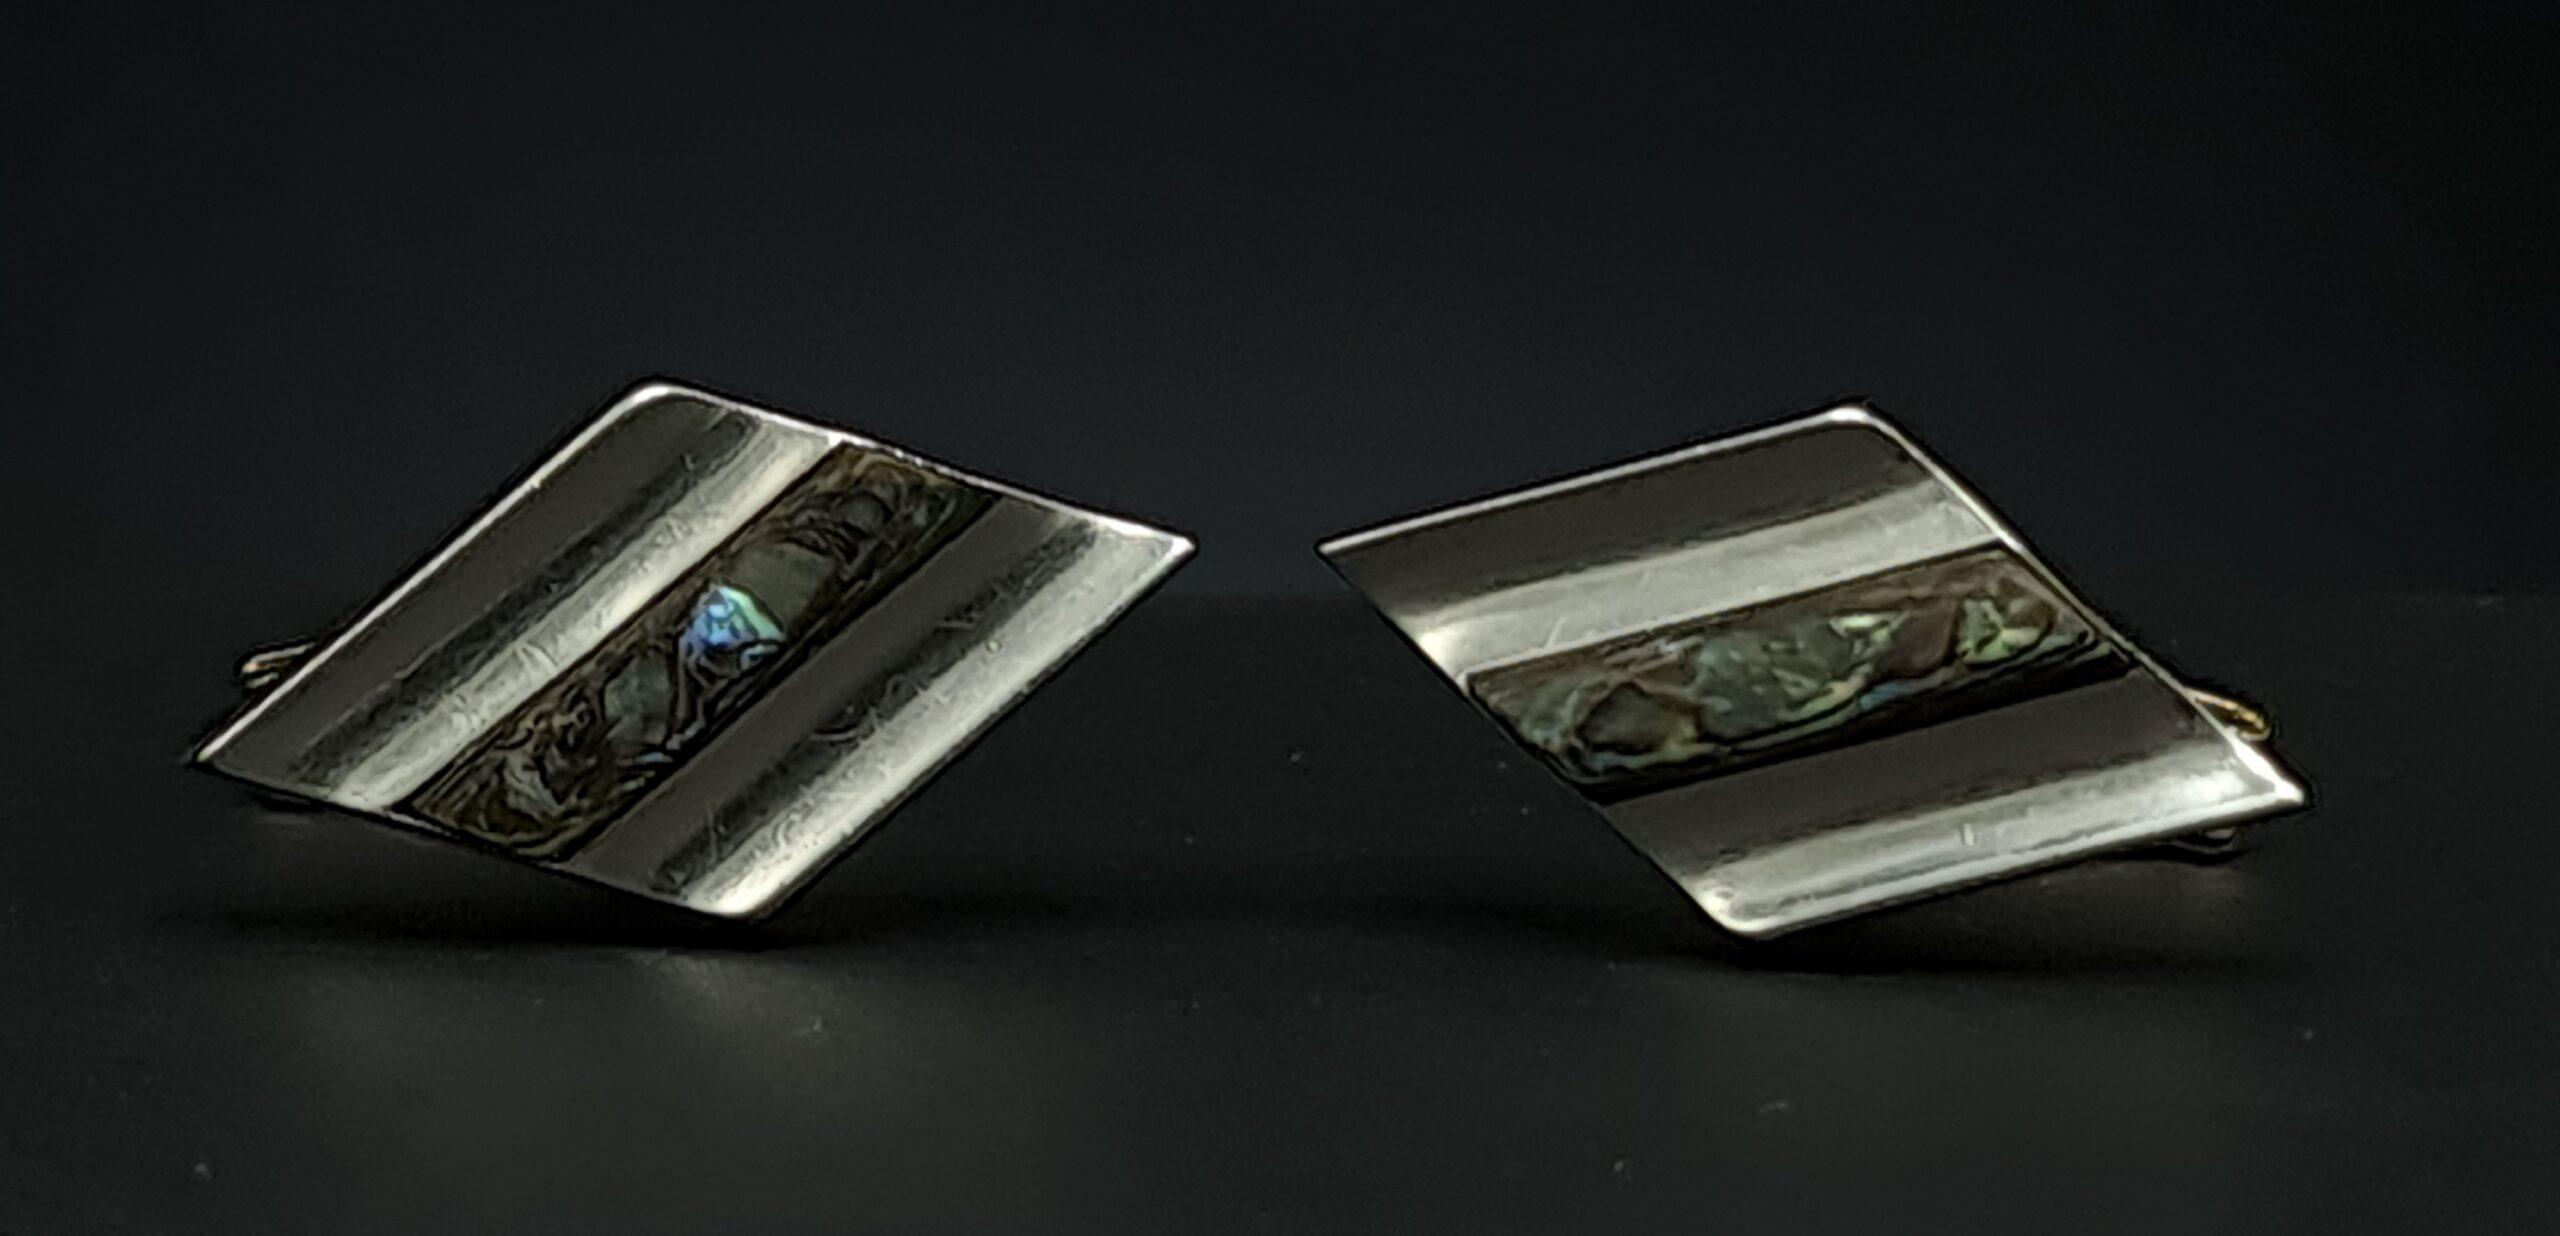 taxco bo cufflinks taxco bo manchetknopen set manchetknopen 925 zilver taxco sterling cufflinks abalone set cufflinks taxco mexico skoander.com